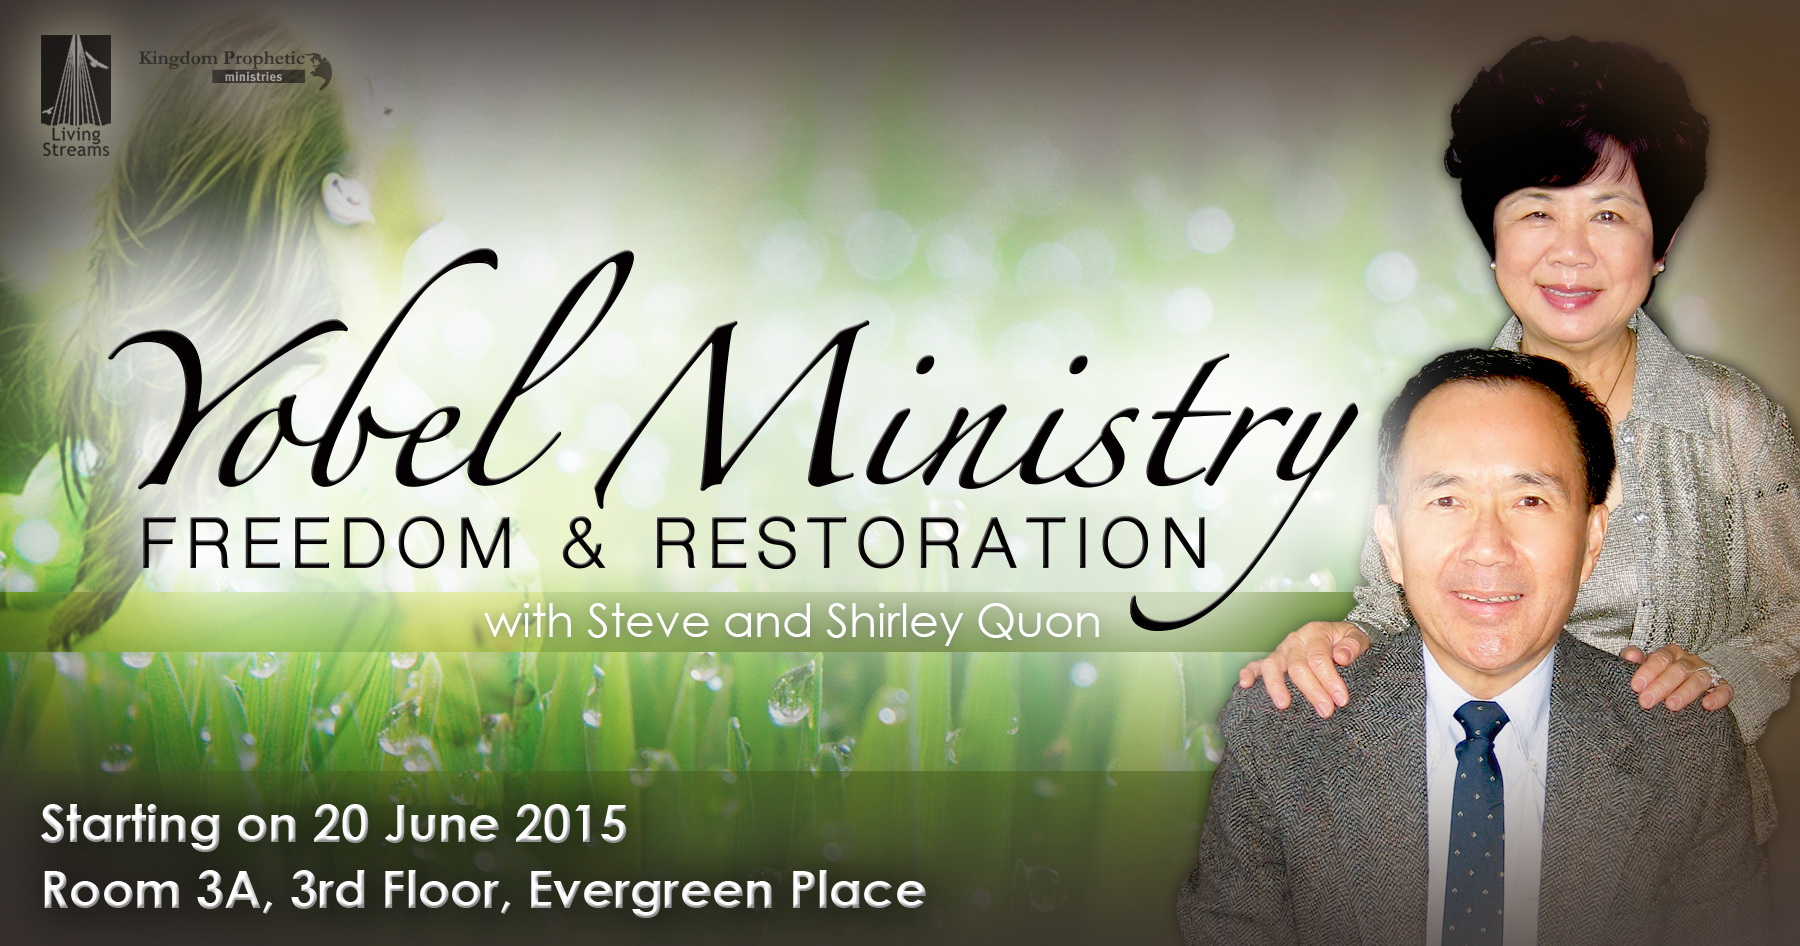 Yobel Ministry